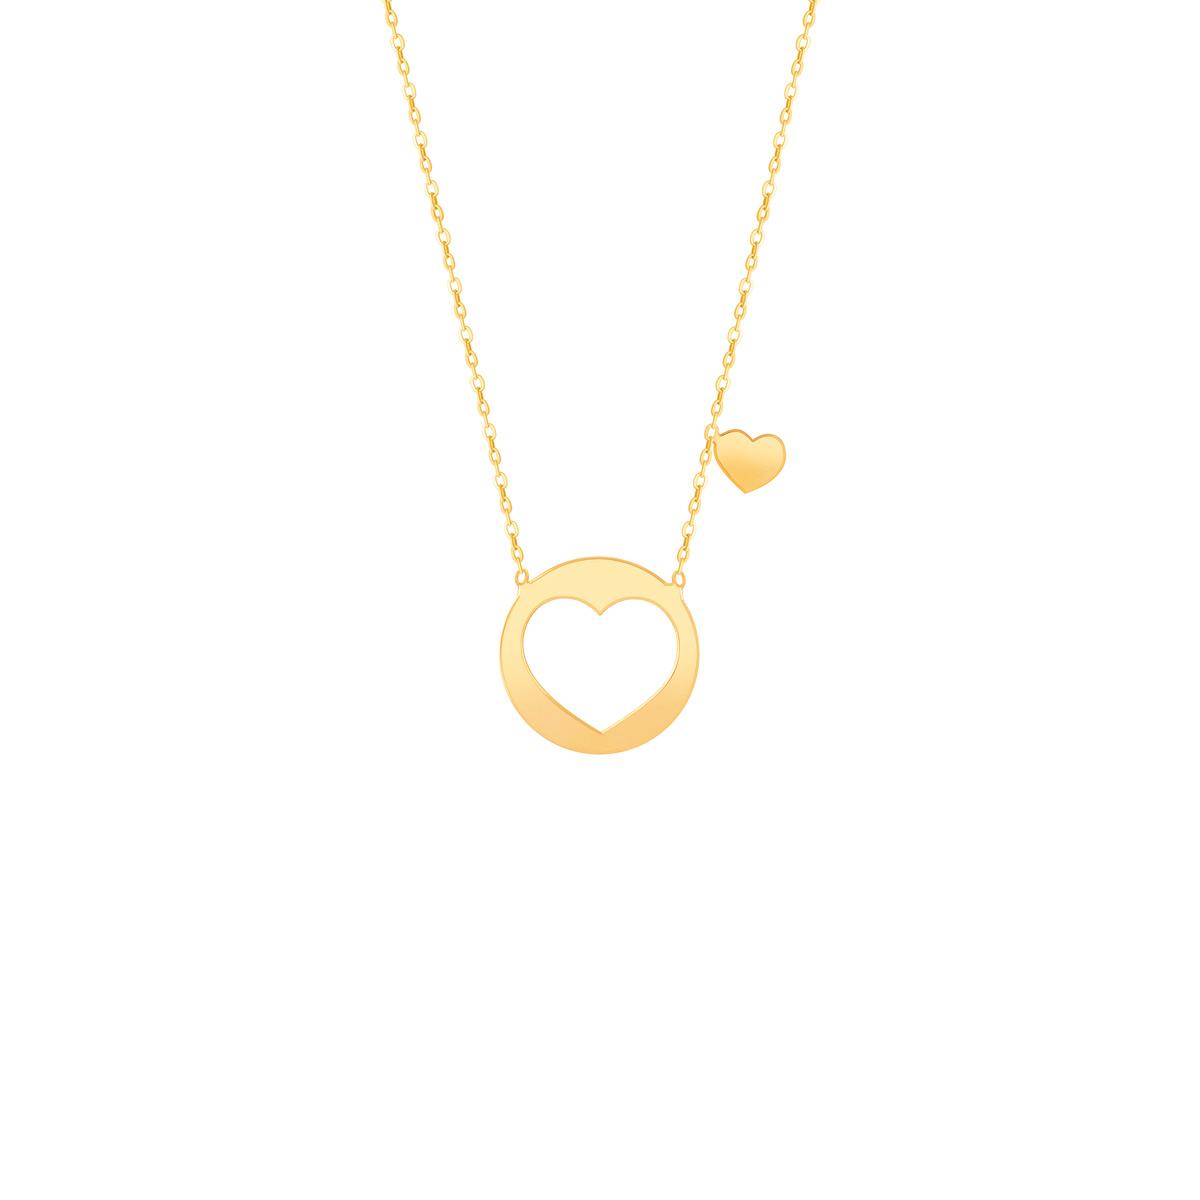 گردنبند طلا پلاک قلب بزرگ